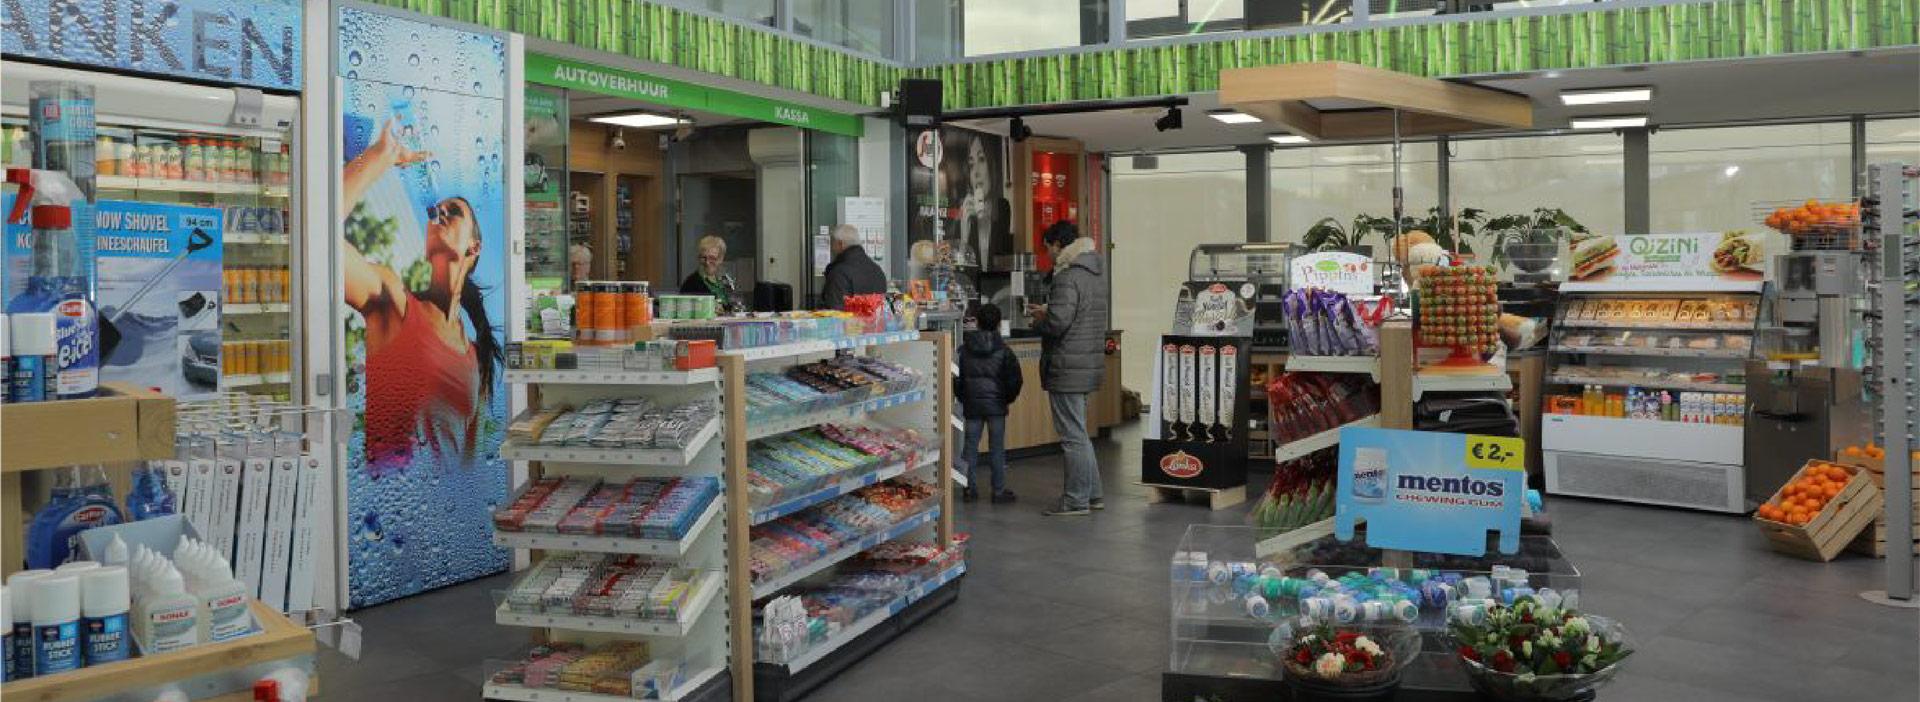 shop autoradam amsterdam